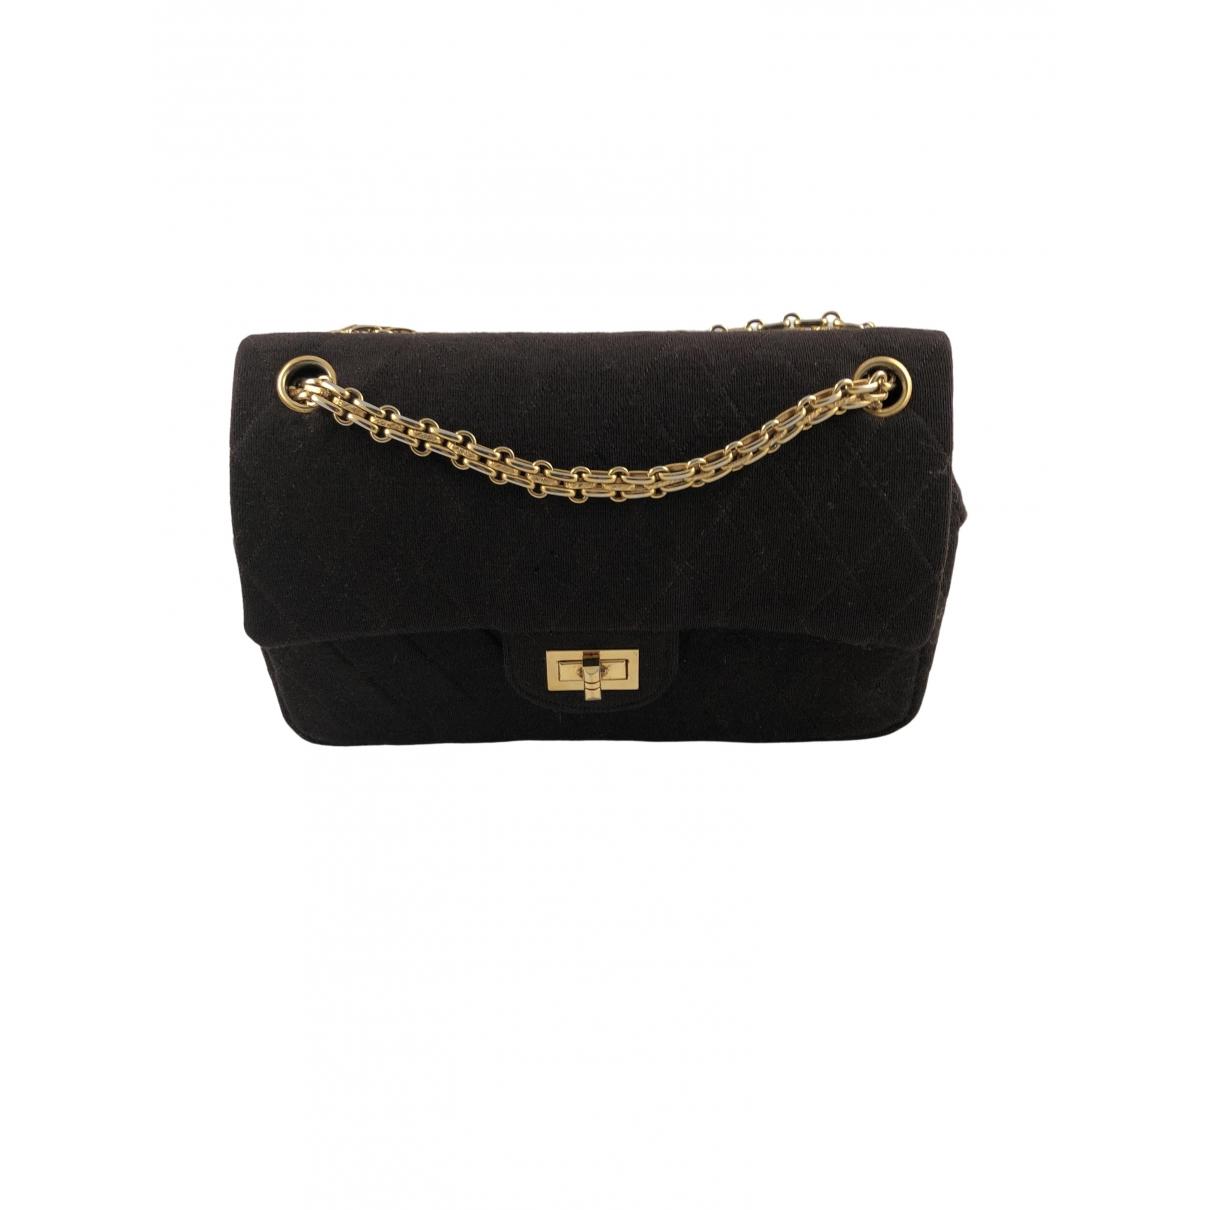 Chanel 2.55 Brown Cloth handbag for Women \N